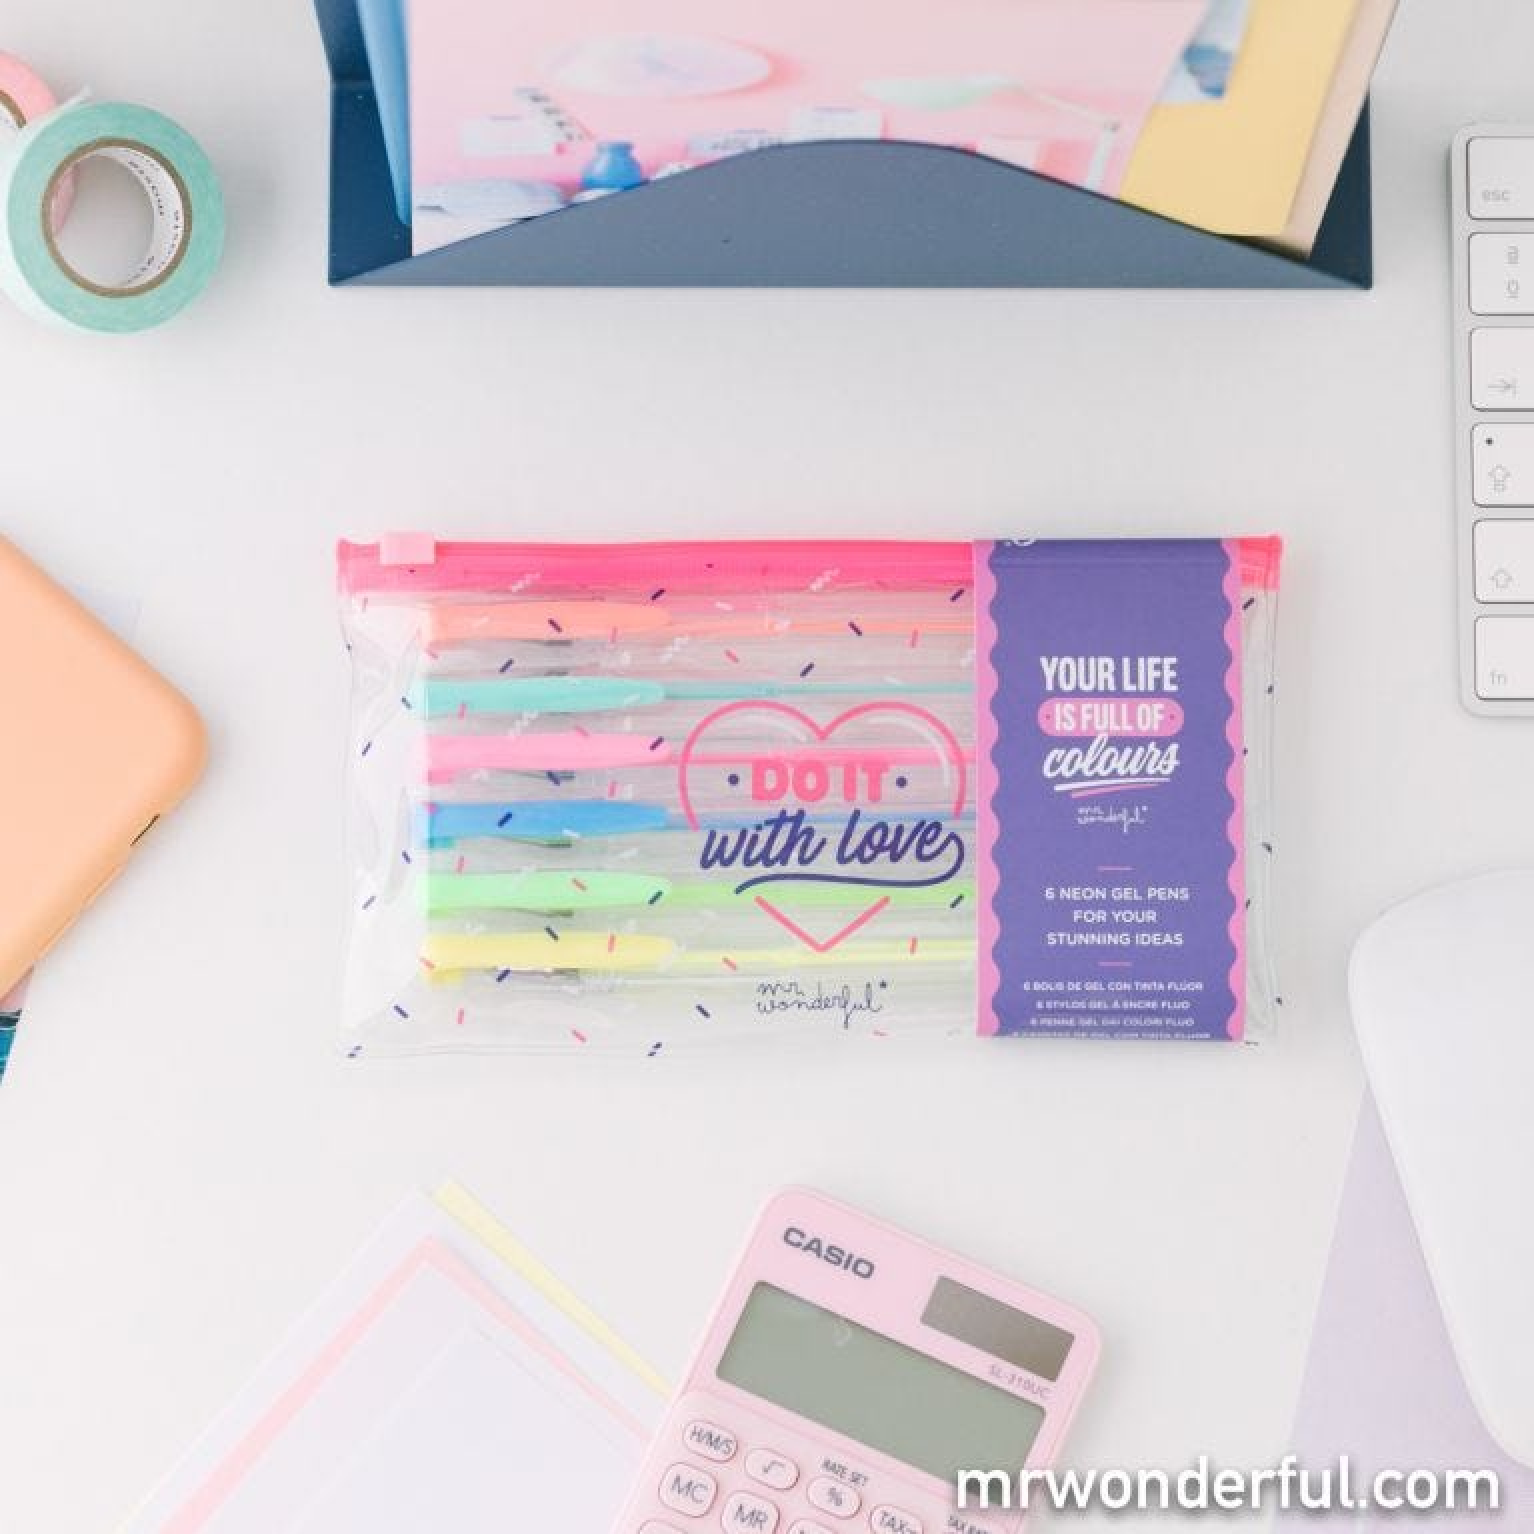 Set de 6 canetas coloridas - Do it with love